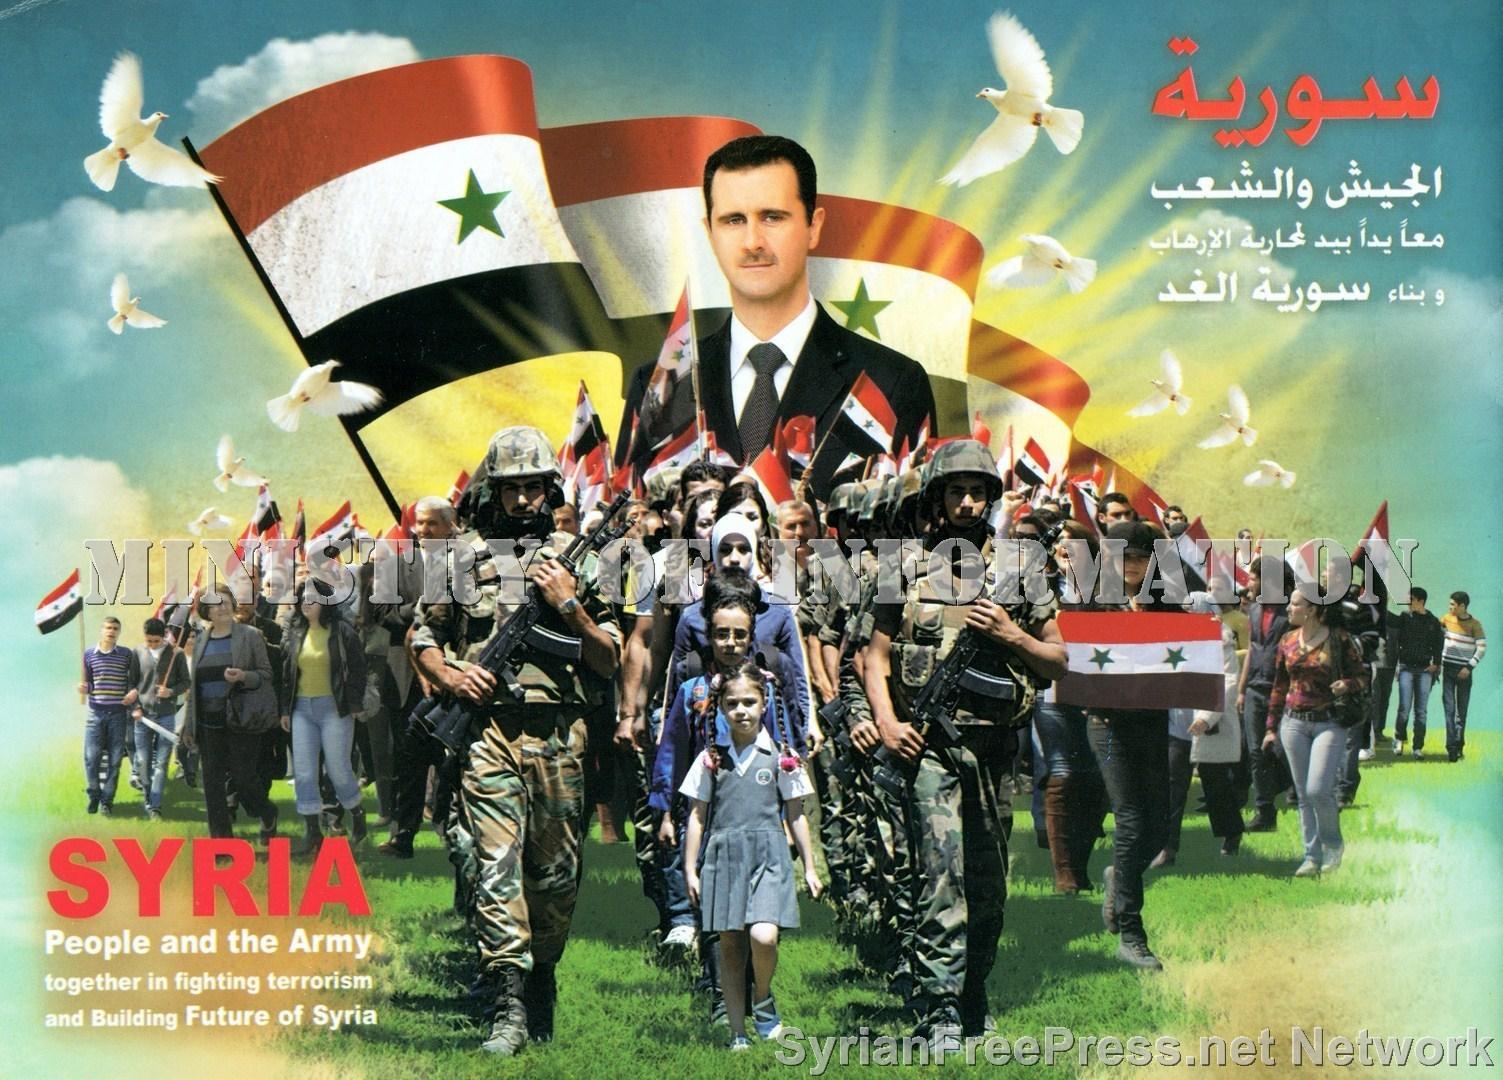 http://syrianfreepress.files.wordpress.com/2013/01/syria-bashar-people-and-army-2013-01-18.jpg